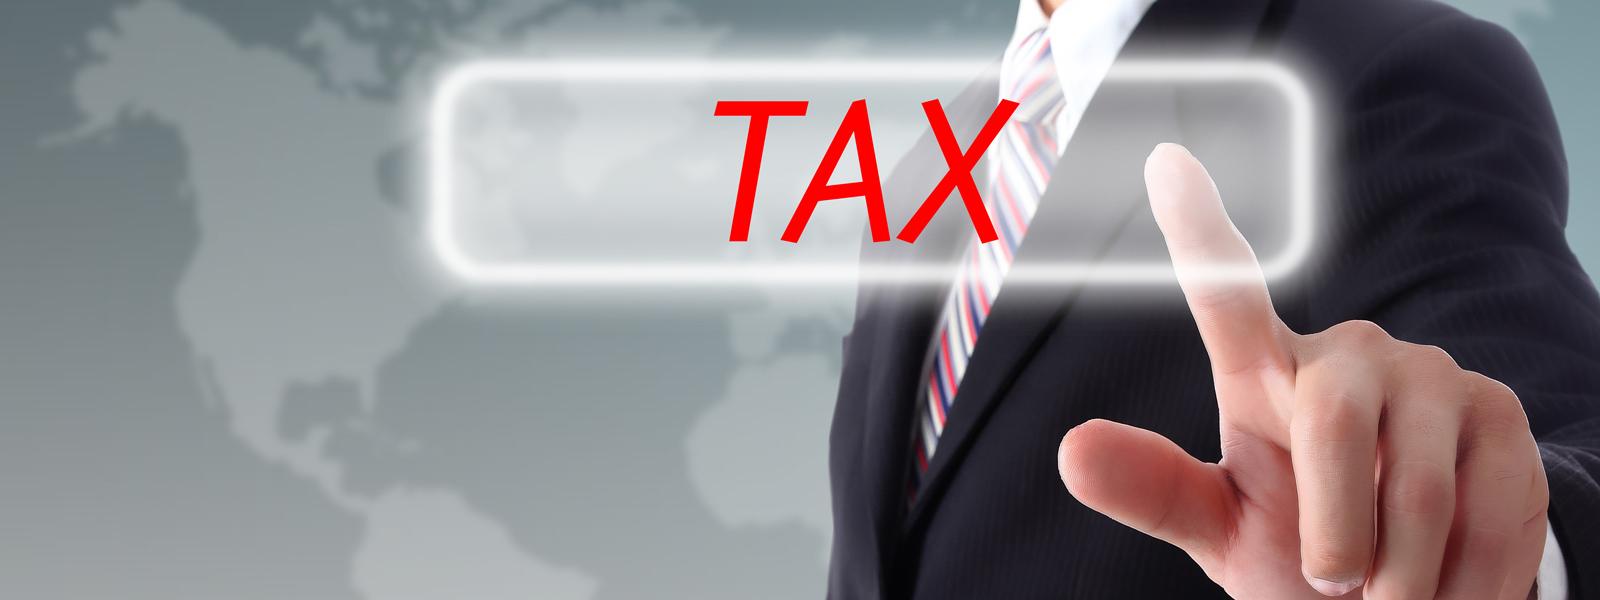 Tax Accountant